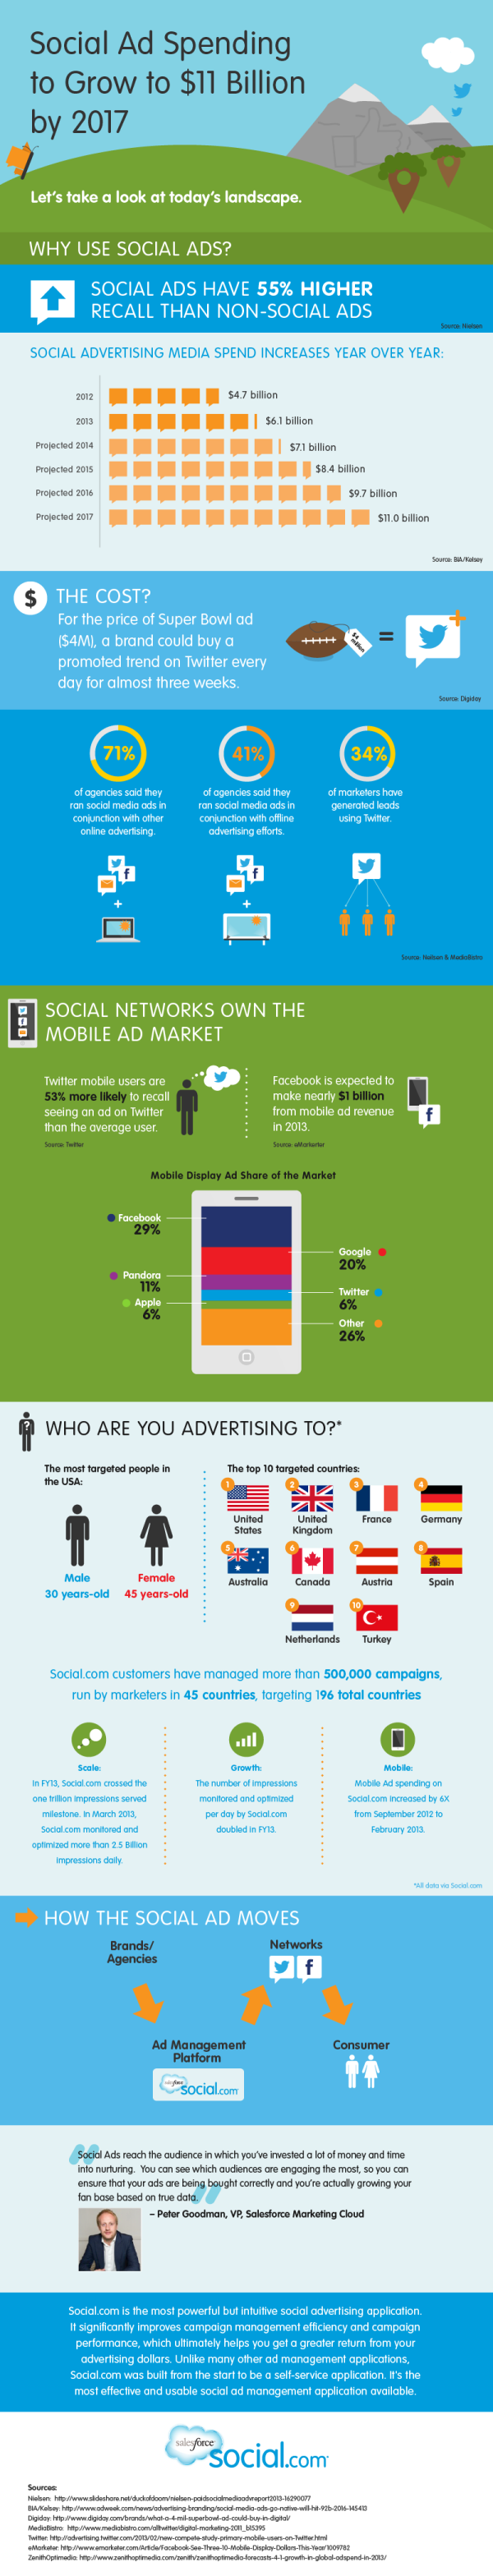 Social Media Ads Infographic resized 600